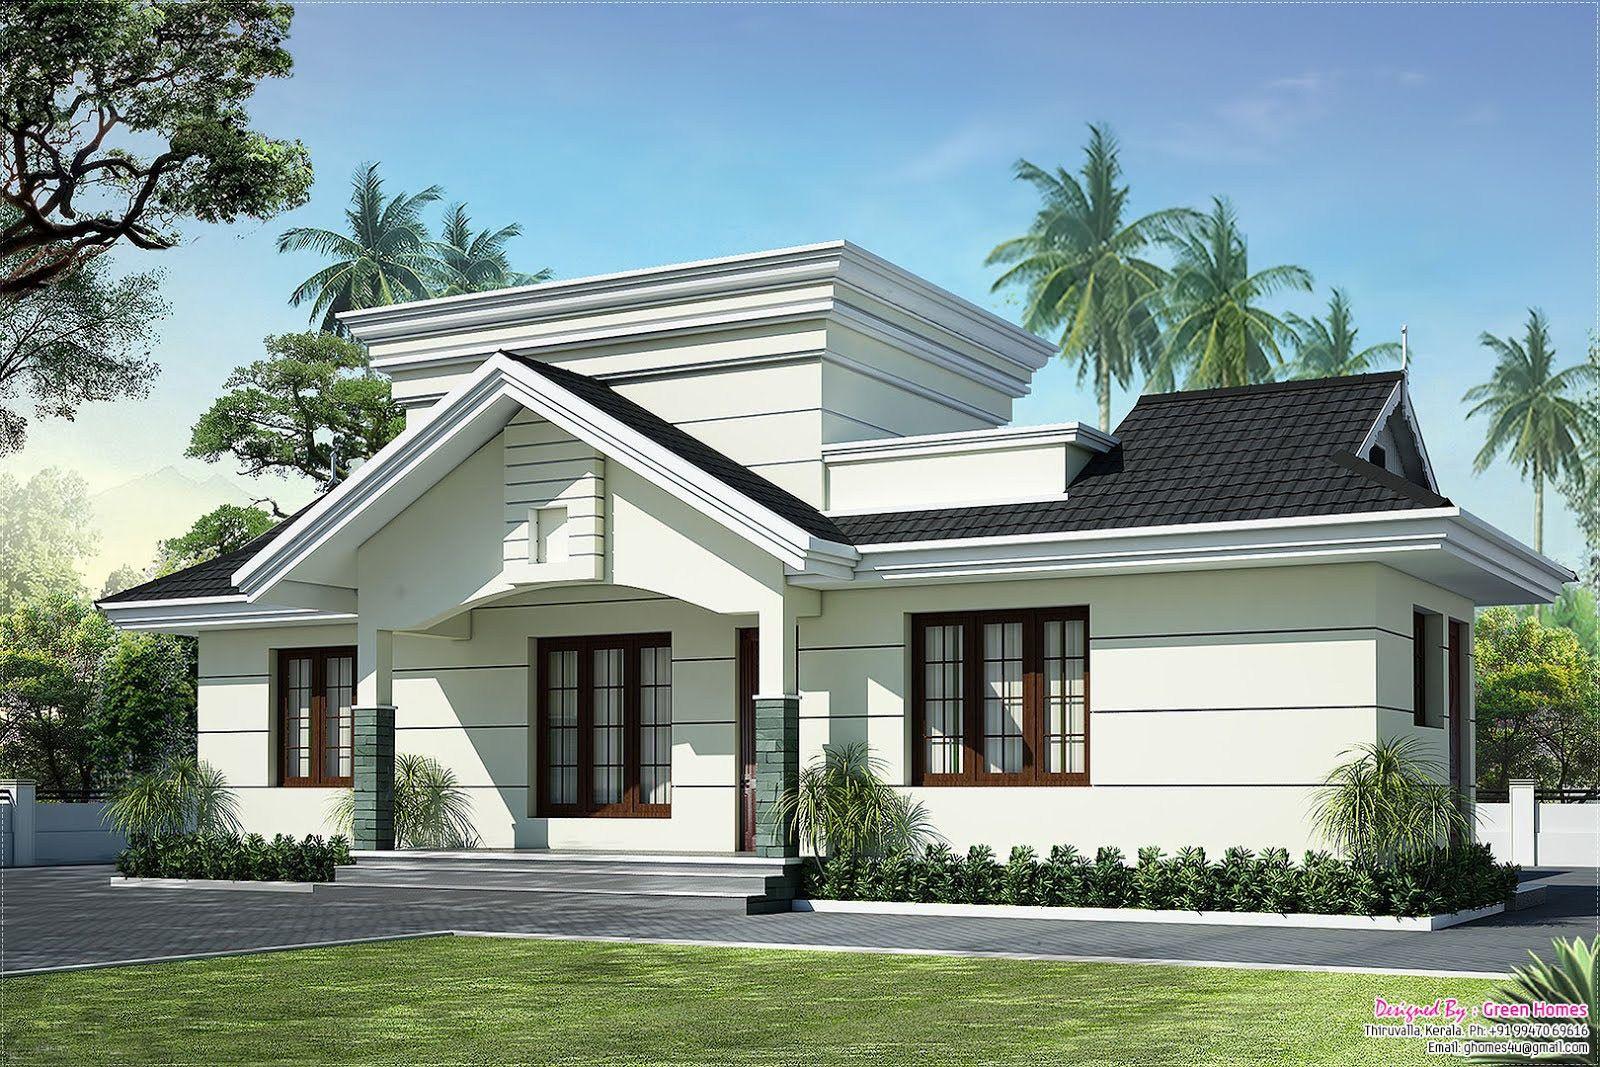 Sq Ft Apartment Floor Plan Sq Ft Floor Plans English Cottage English Style Home Sq Ft Sq Squar Kerala House Design House Construction Plan Bungalow House Plans